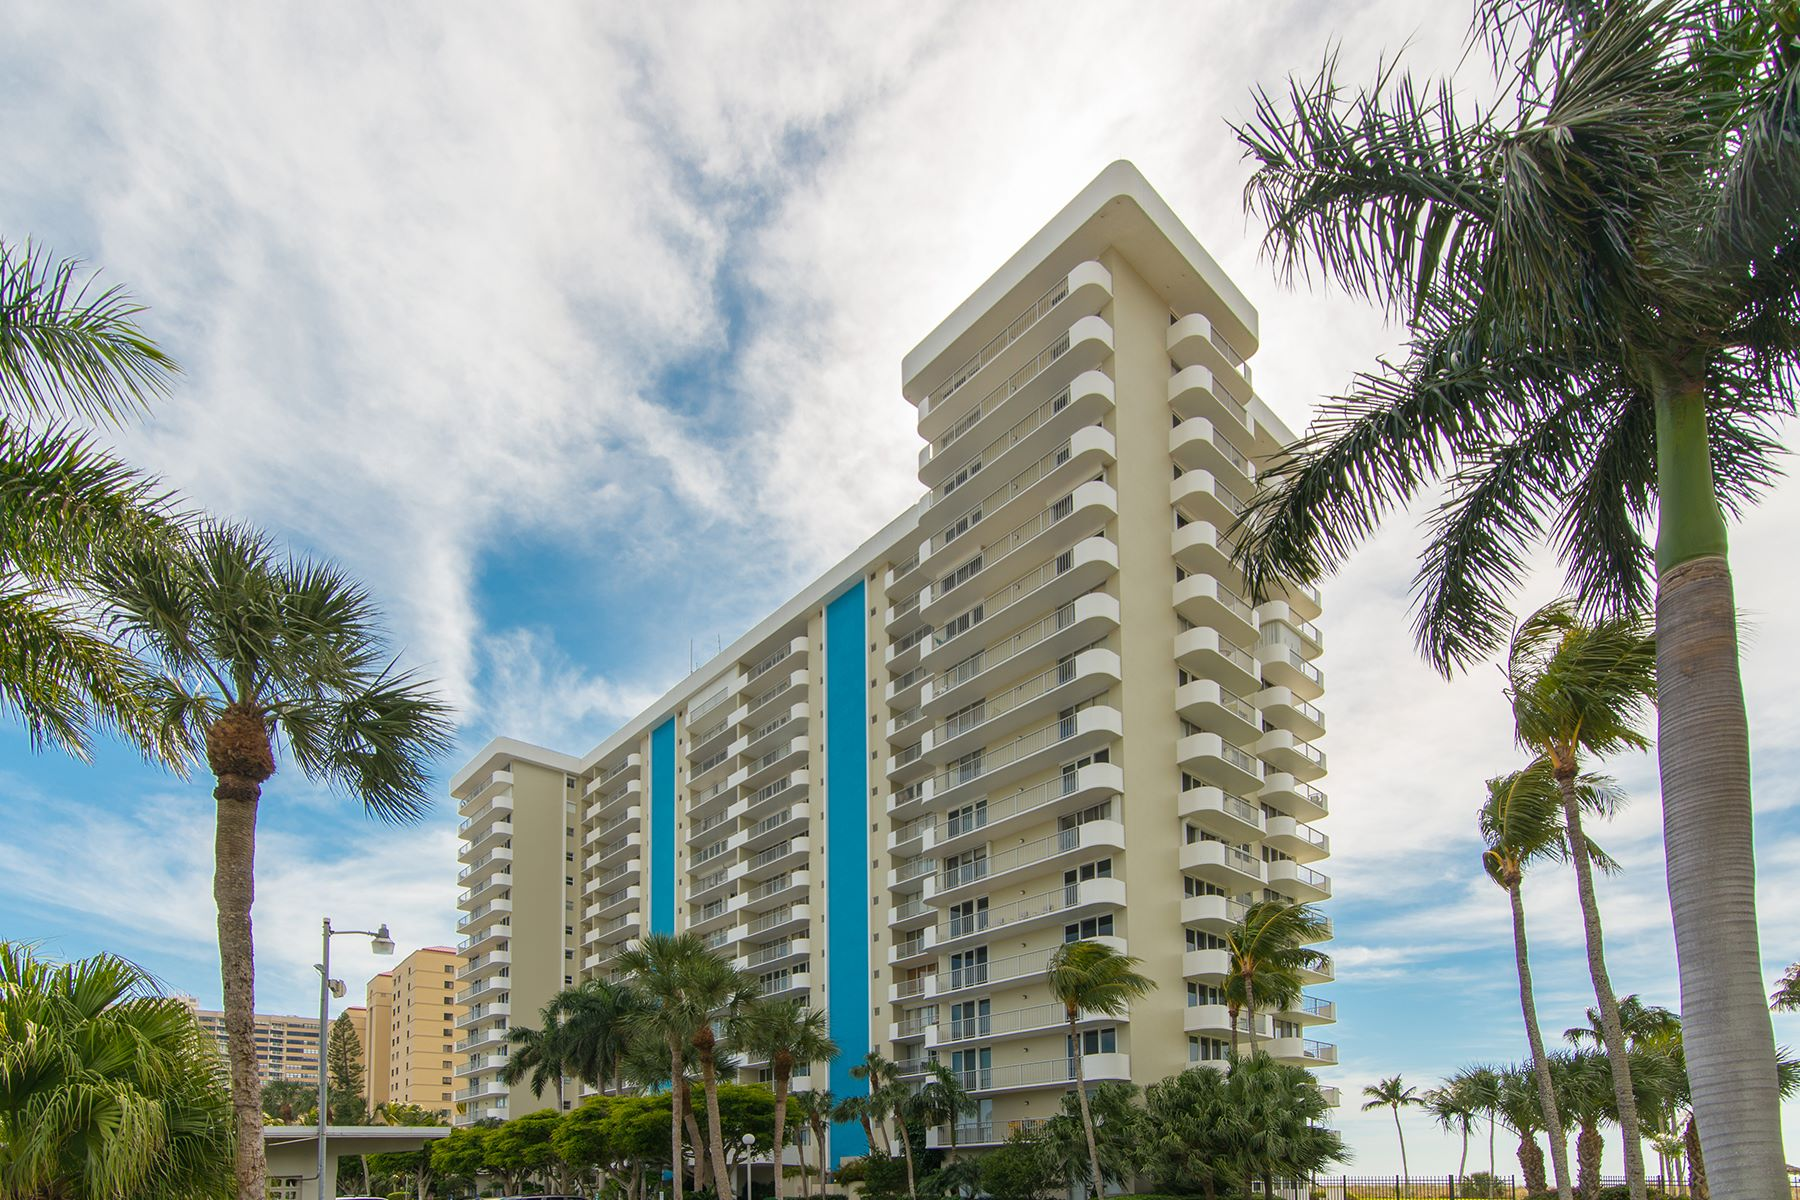 共管物業 為 出售 在 MARCO ISLAND - ADMIRALTY HOUSE SOUTH 140 Seaview Ct S 1104S Marco Island, 佛羅里達州, 34145 美國